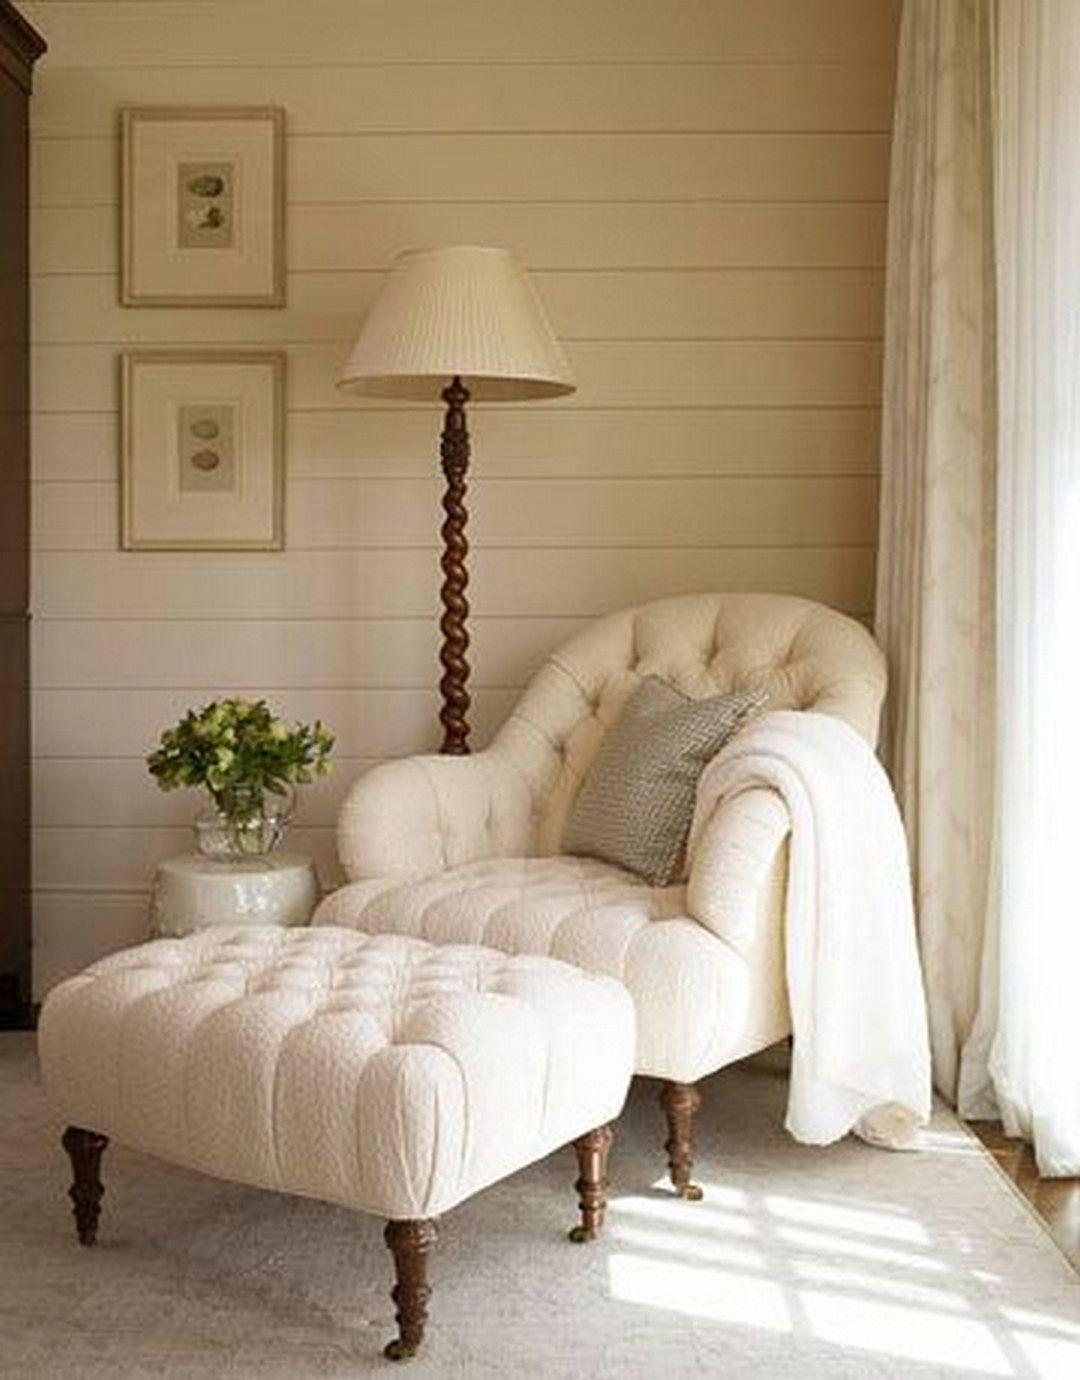 114 Cozy Reading Room Interior Ideas | Gorgeous Interior Ideas ...